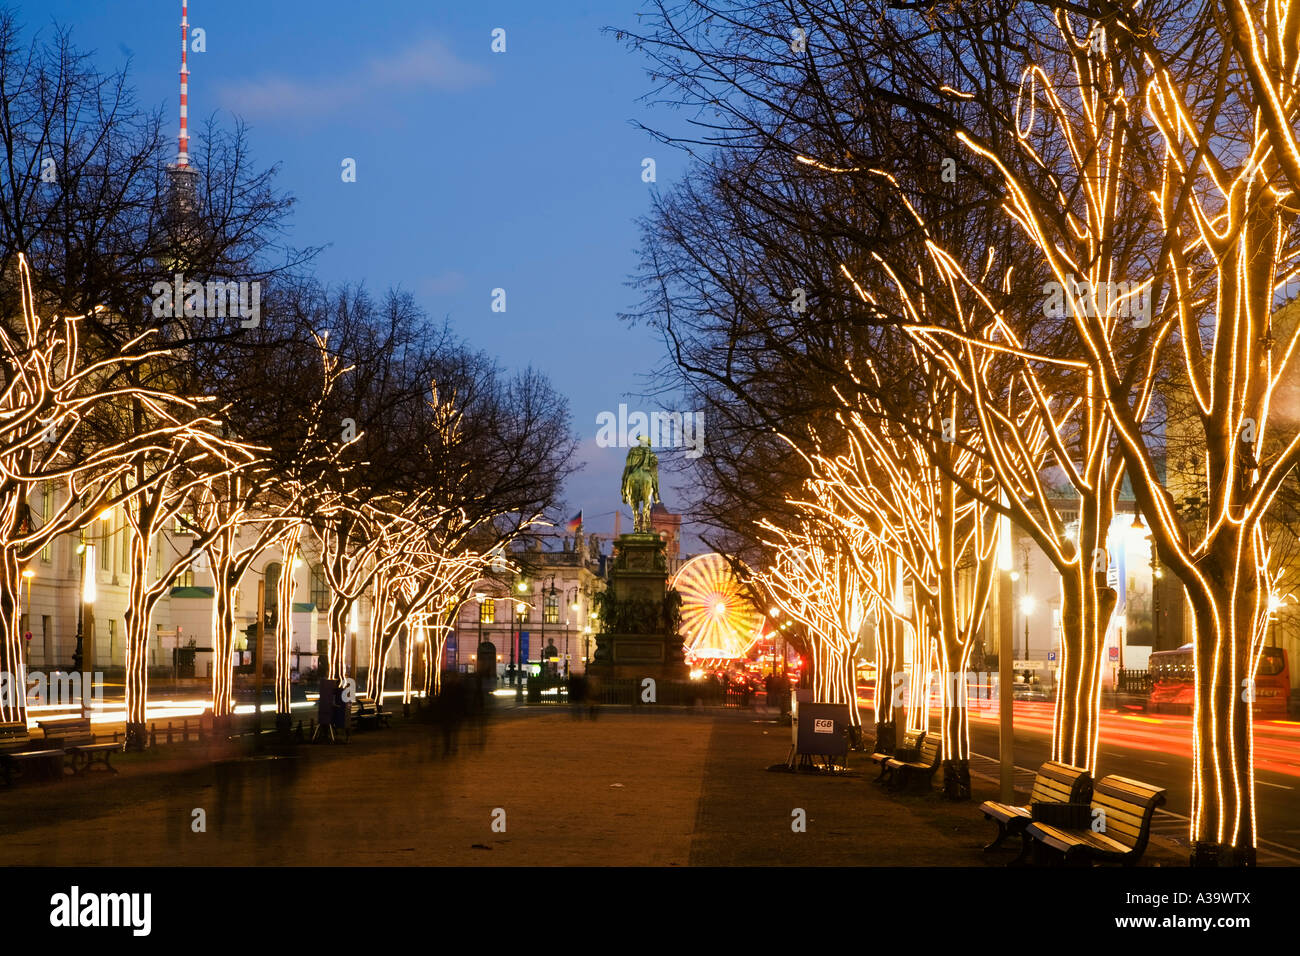 berlin brandenburger tor christmas illumination weihnachtsbeleuchtung stock photo royalty free. Black Bedroom Furniture Sets. Home Design Ideas